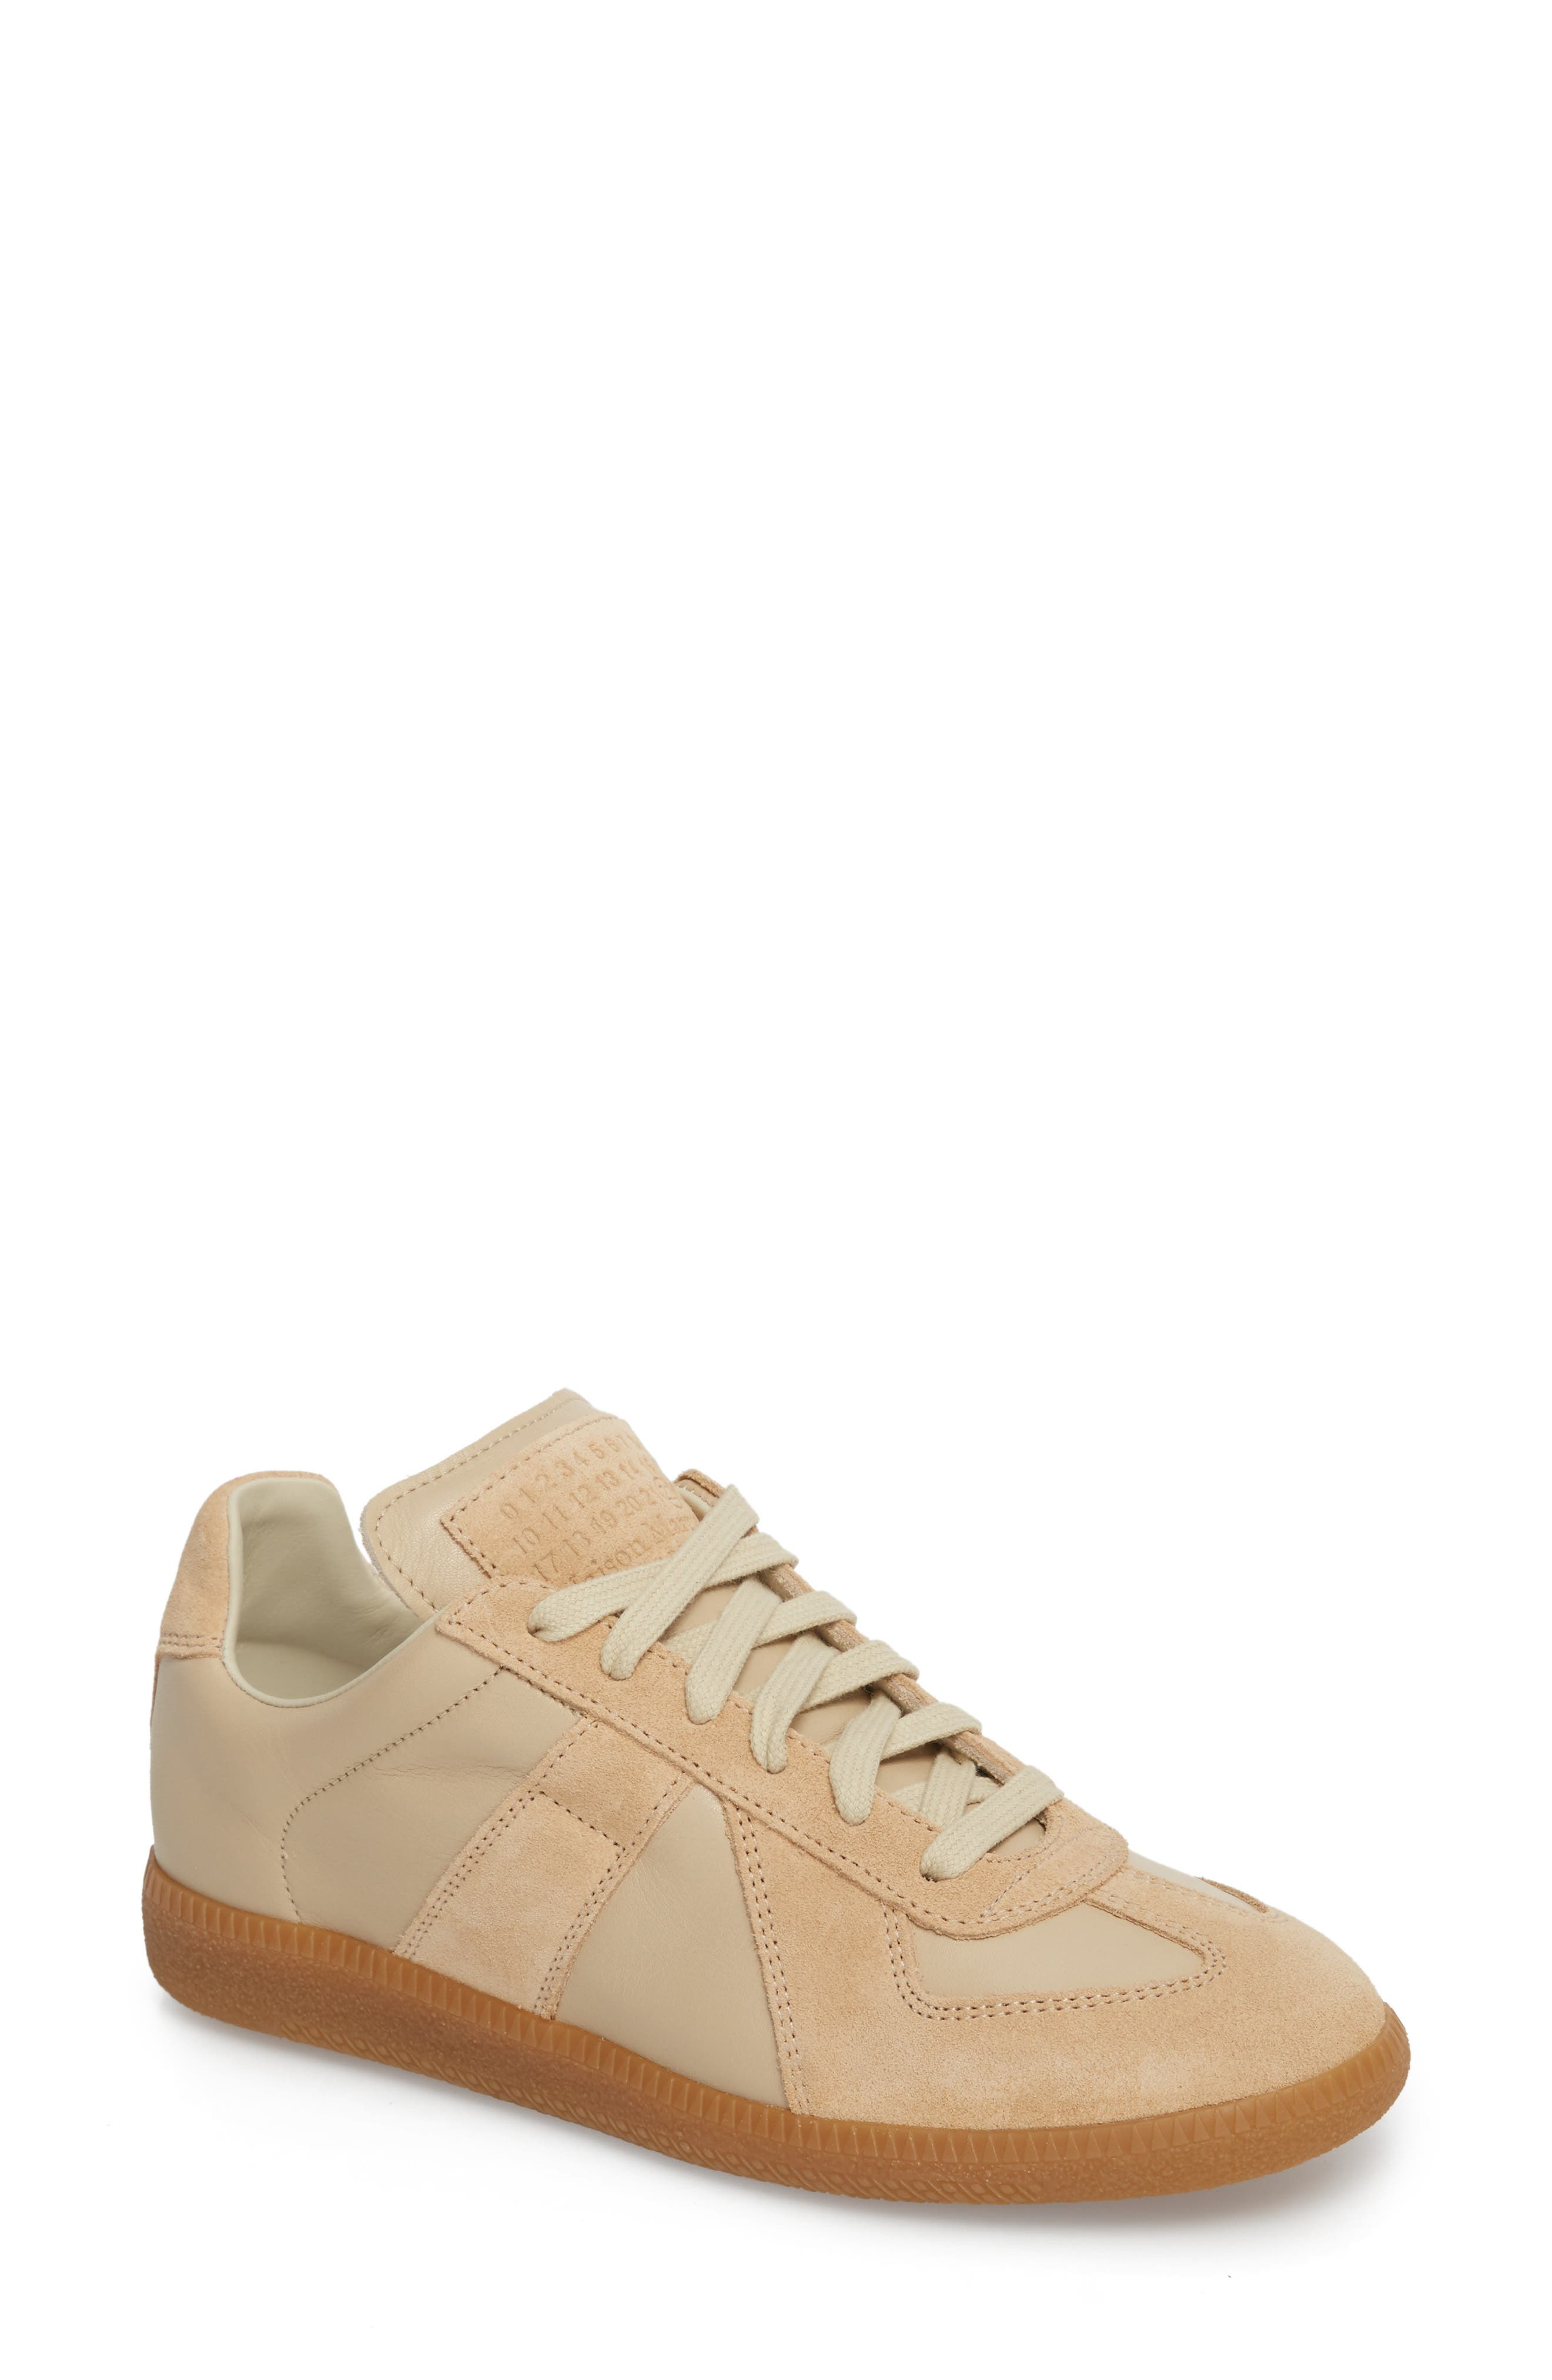 MAISON MARGIELA Replica Sneaker, Main, color, 262